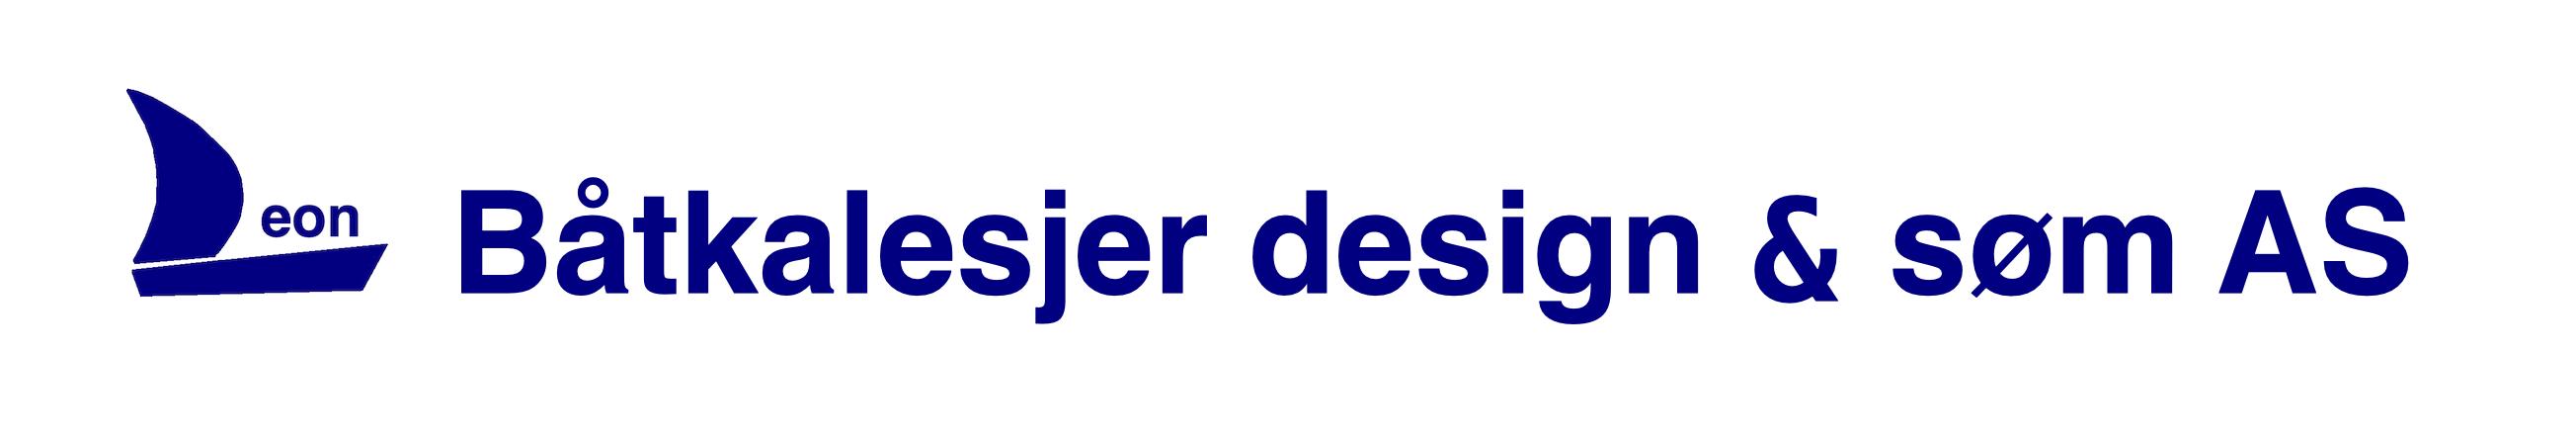 Leon Båtkalesjer & Design AS